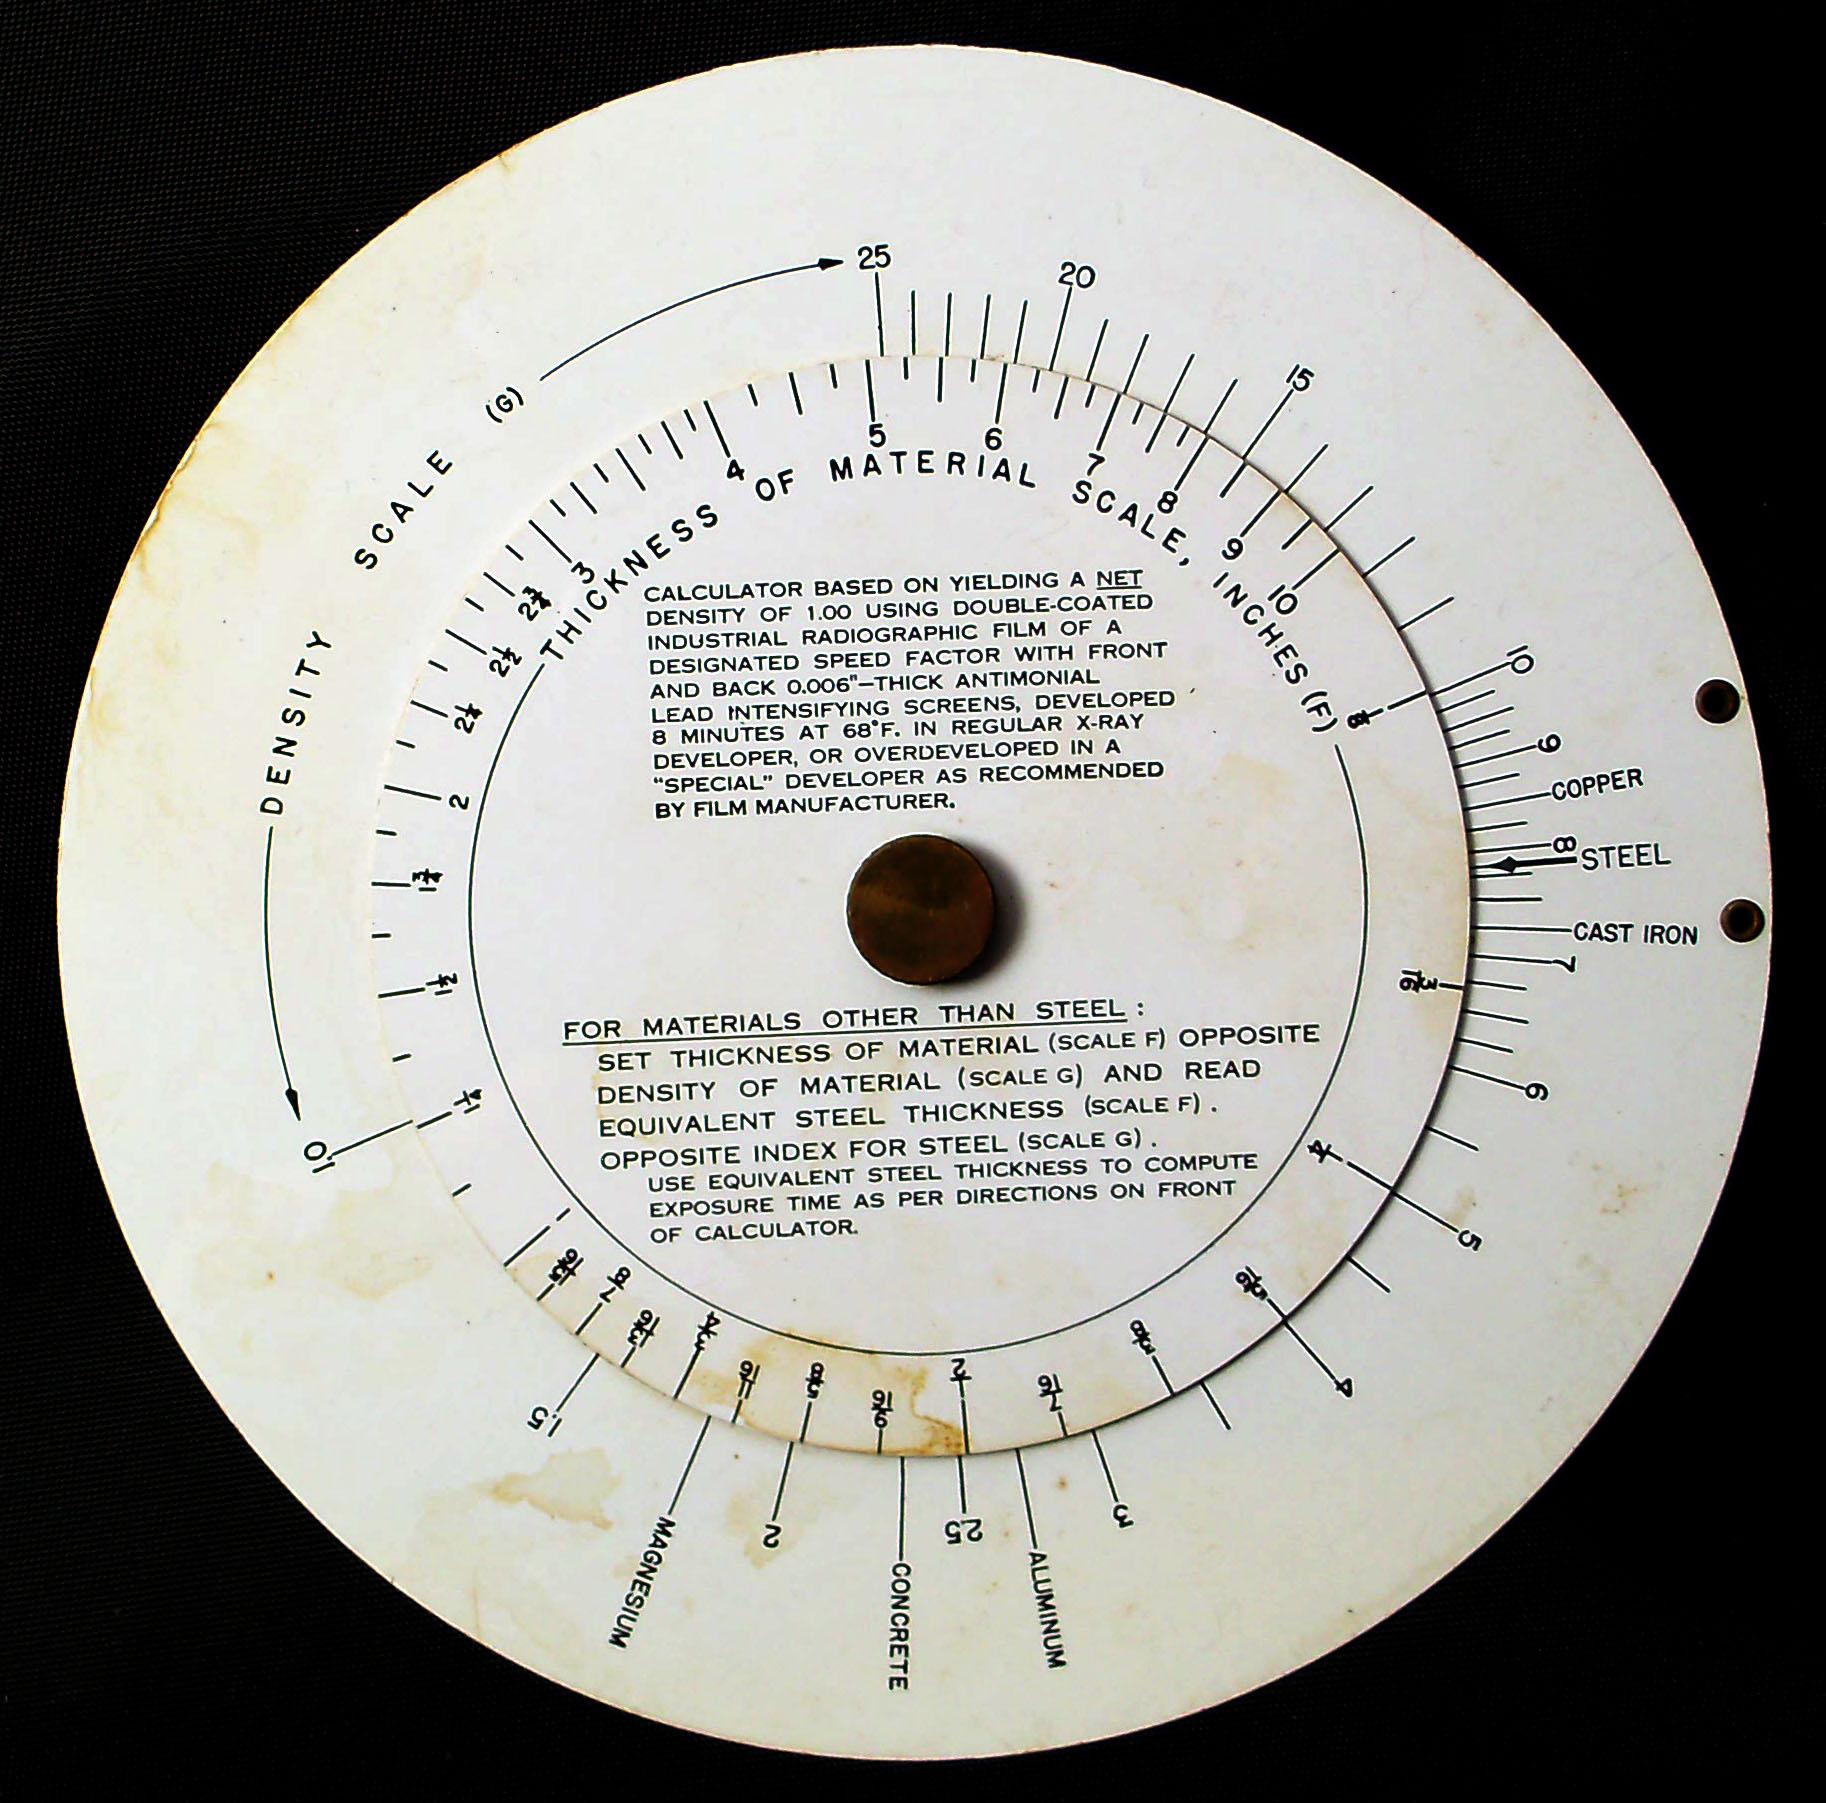 regle-circulaire-radioactivite-09